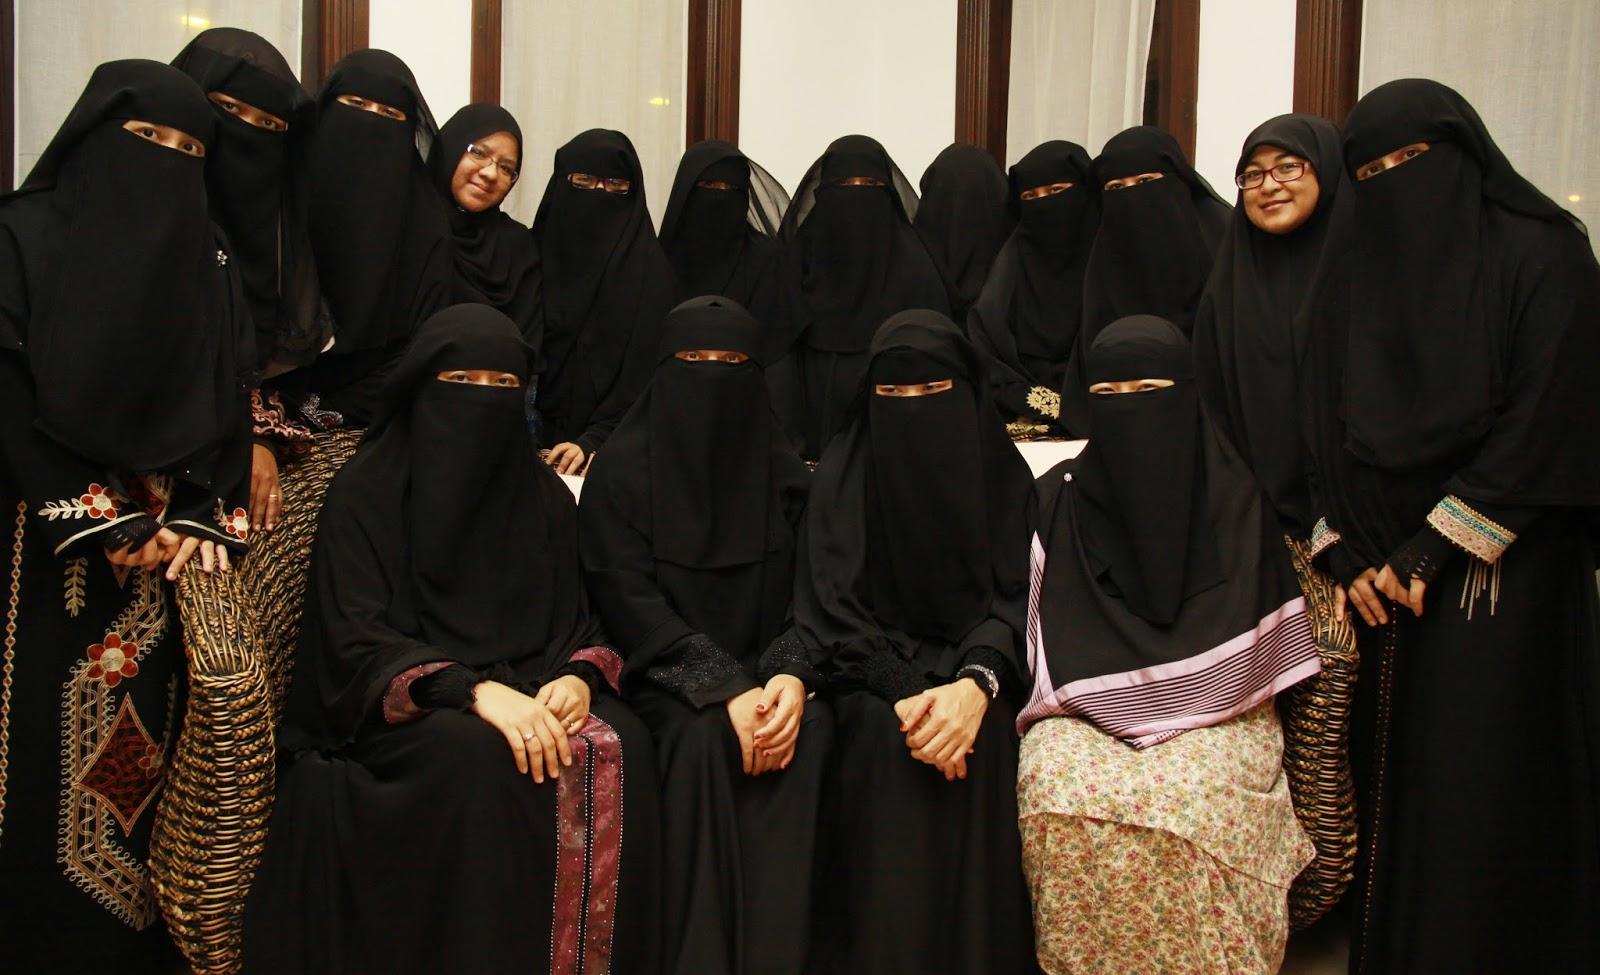 Life in saudi arabia